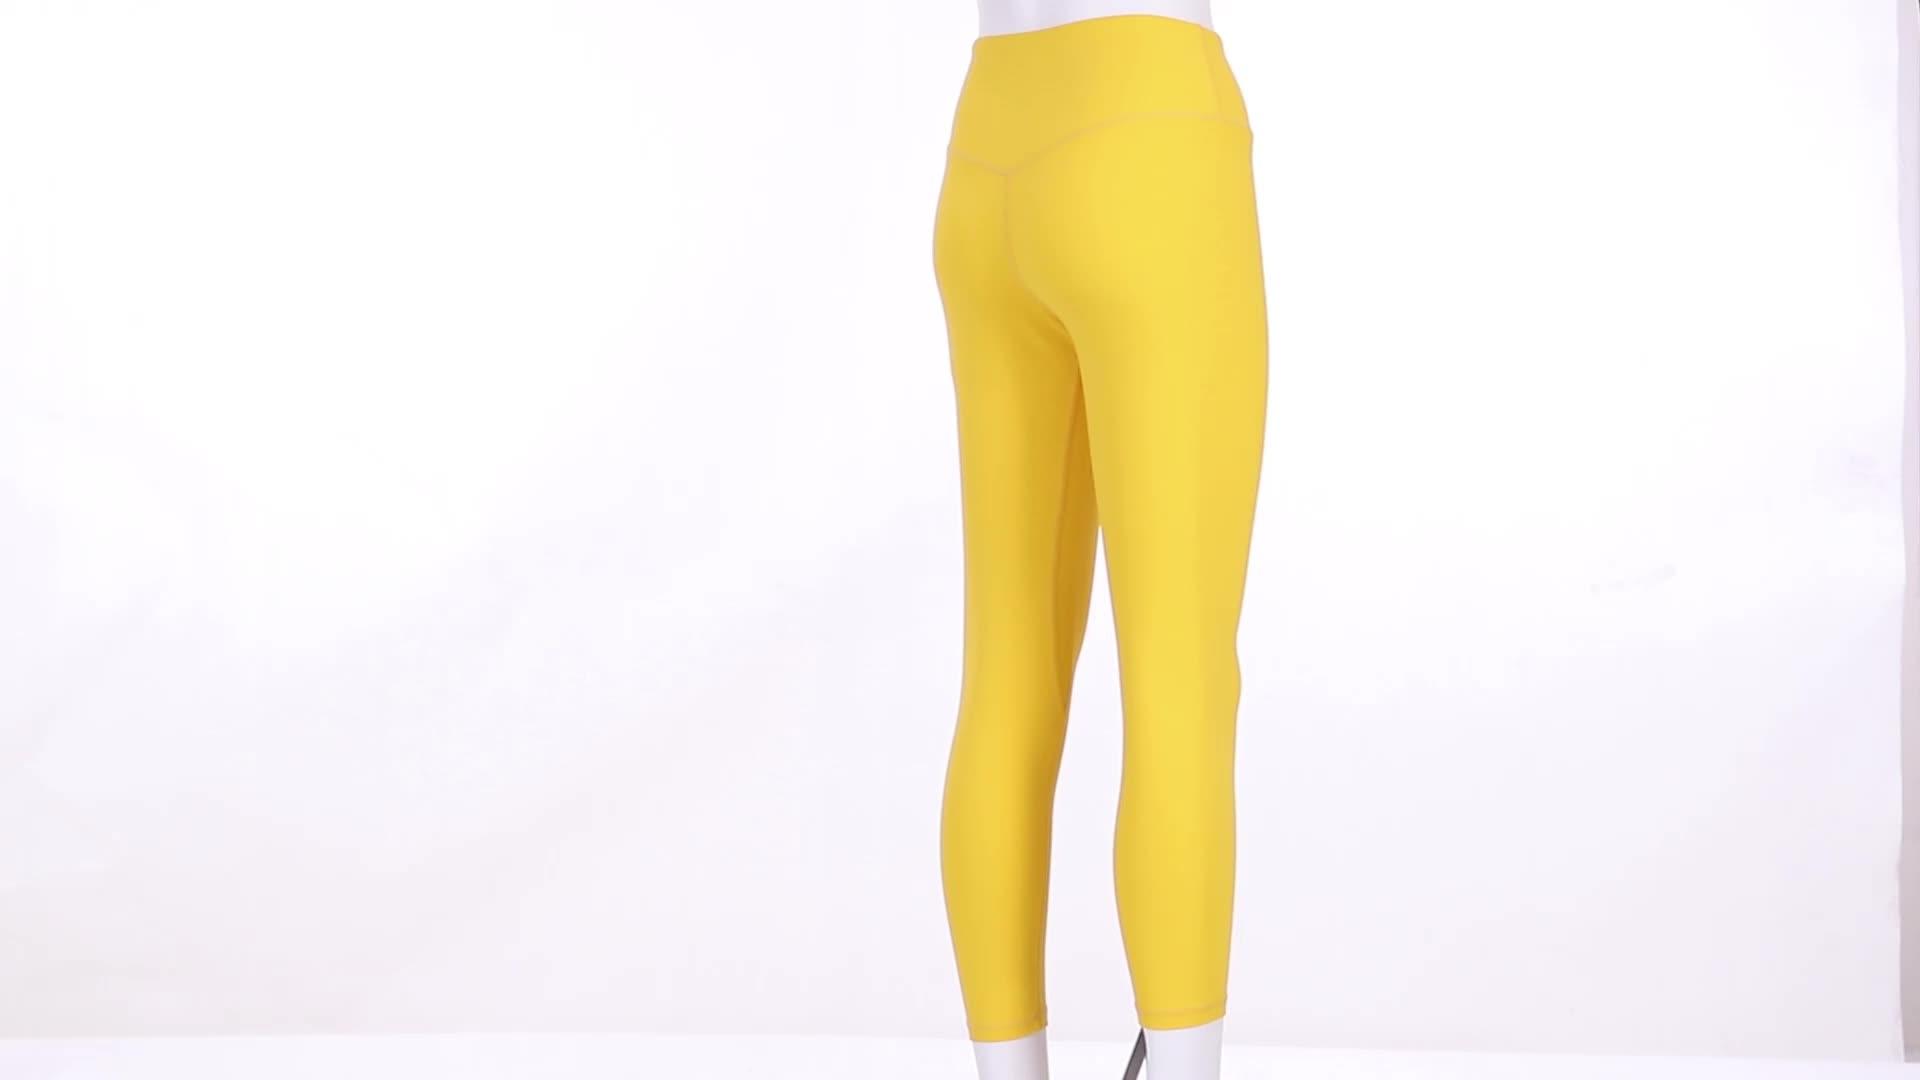 Dri Fit Schlankes Training Leggings Stretch Bauch Kontrolle Sport Laufen Digital Gedruckt Sublimation Recycled Yoga Hosen Frauen